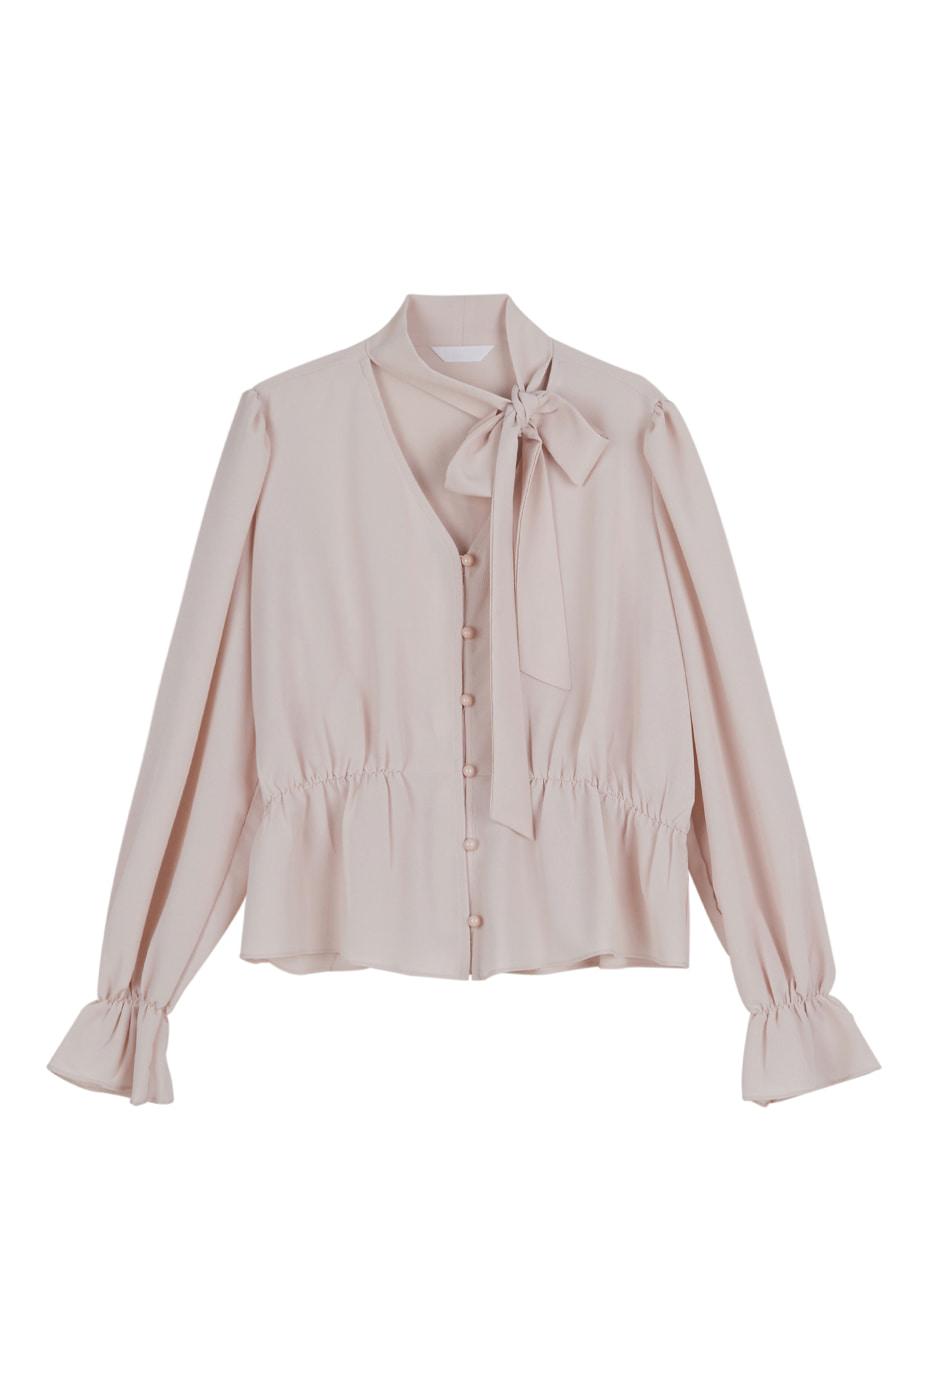 Rose tie blouse